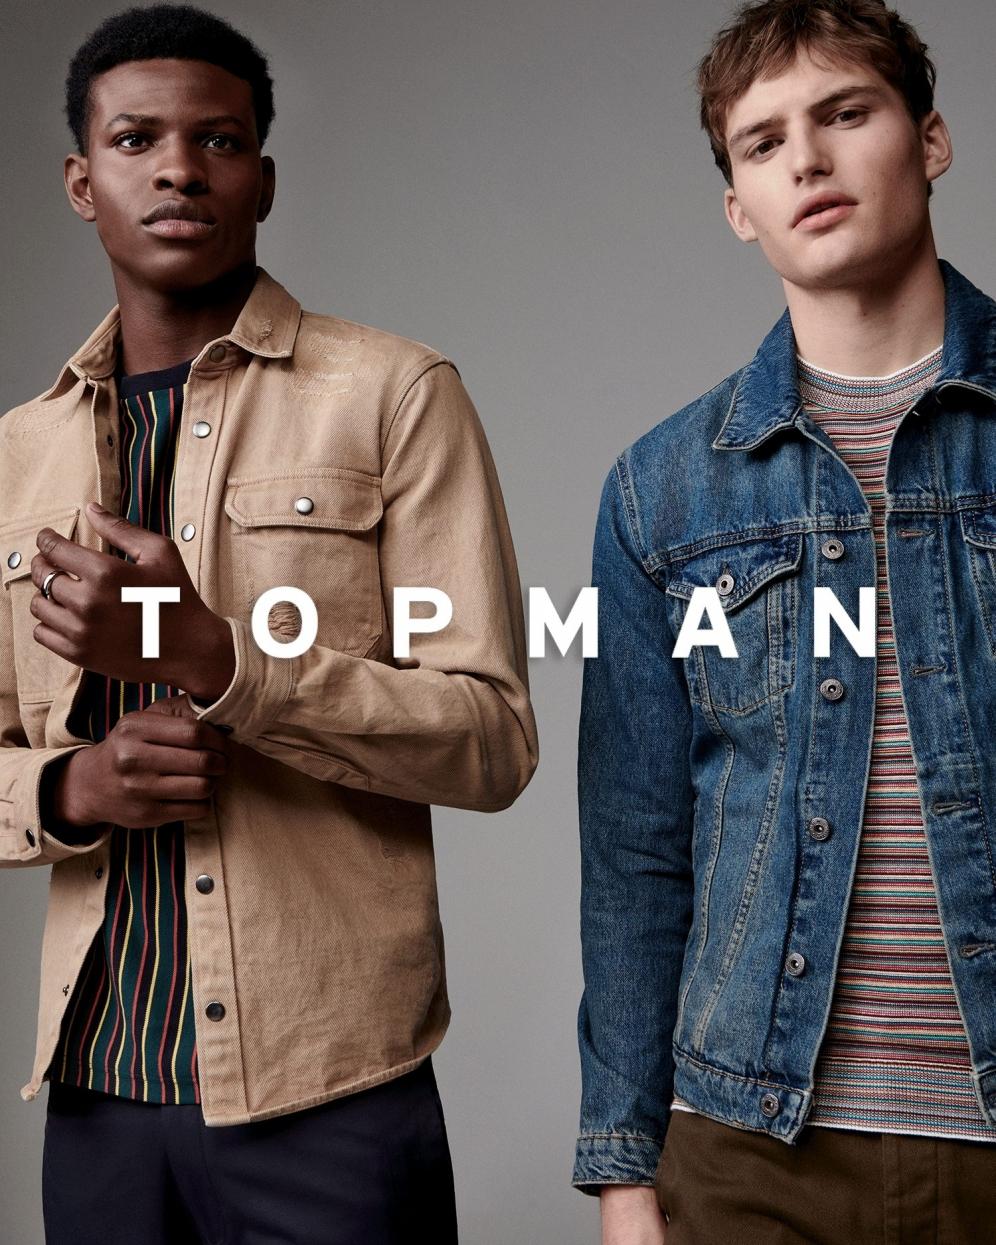 Topman | Northern Quarter